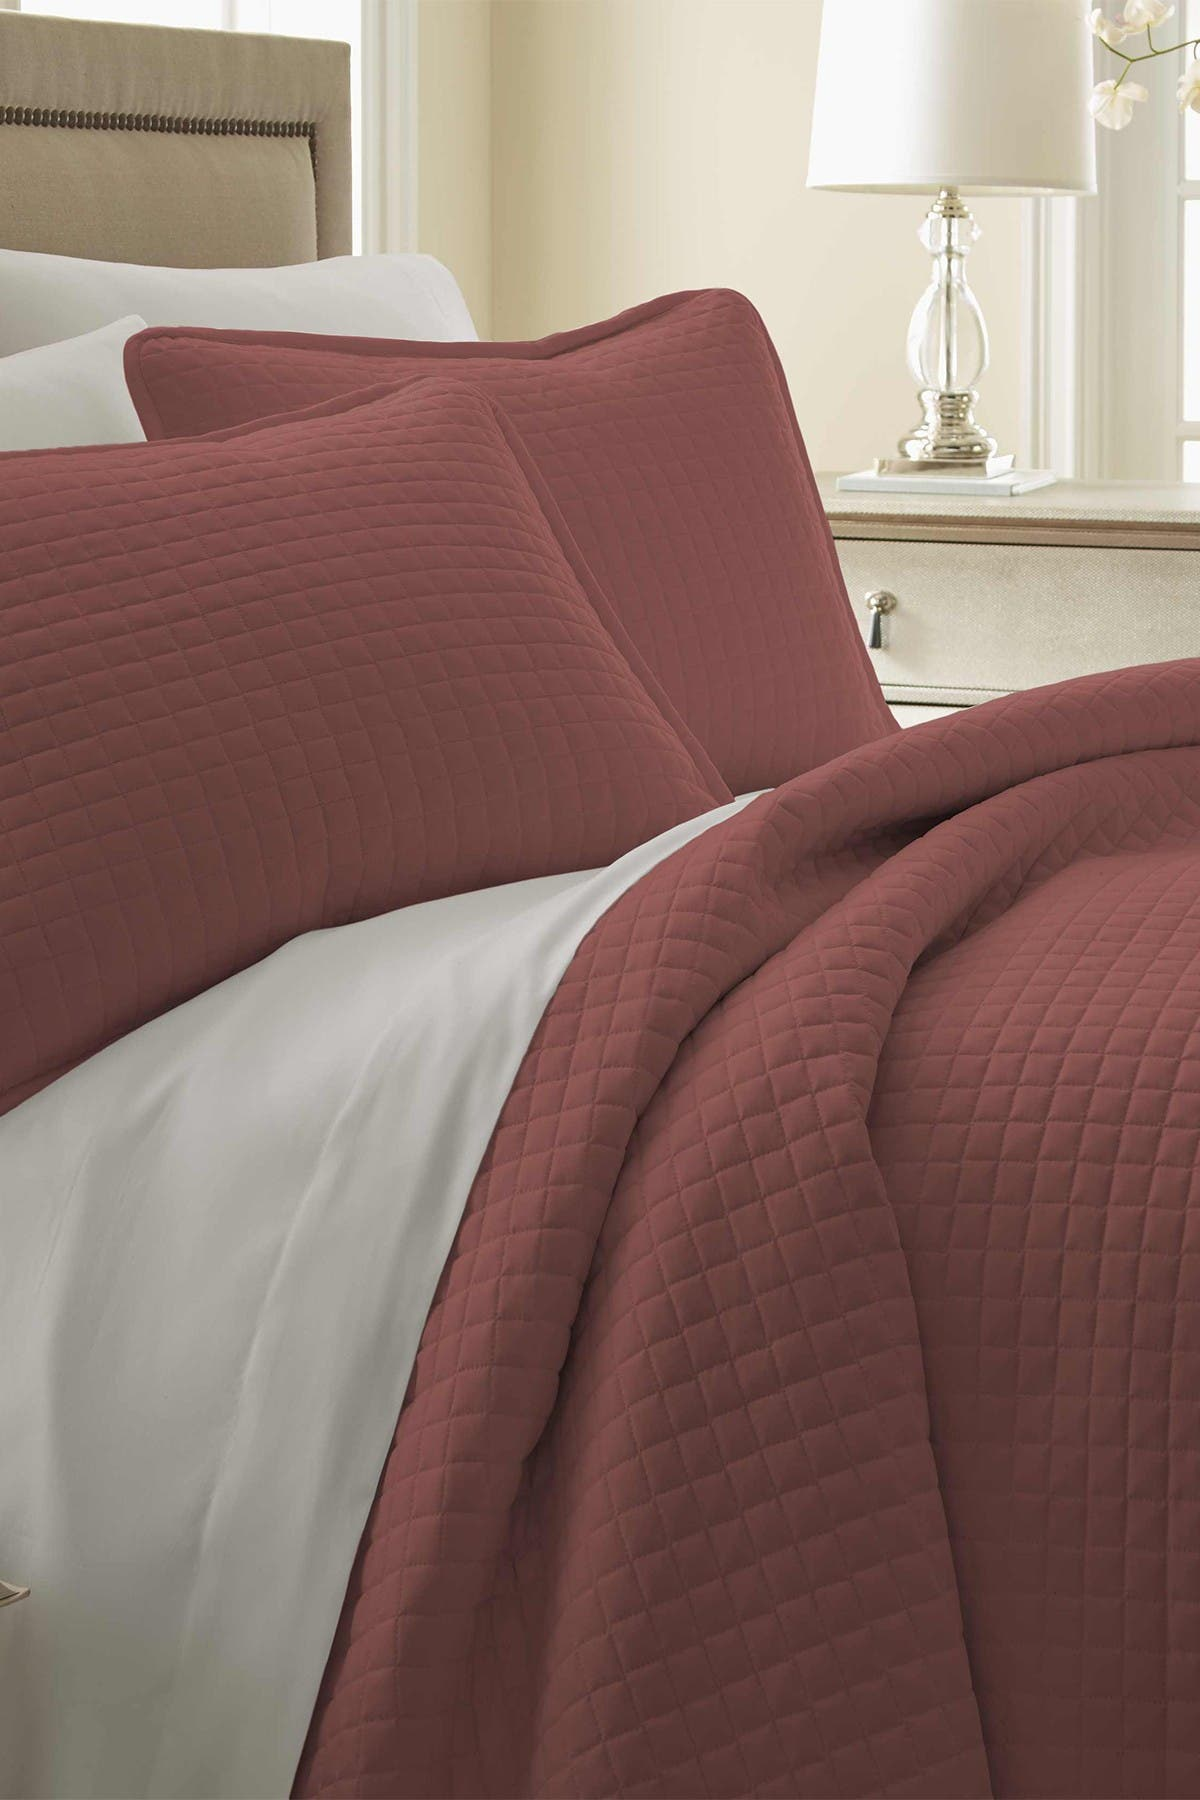 Image of SOUTHSHORE FINE LINENS Full/Queen Southshore Fine Linens Vilano Springs Oversized Quilt Set - Marsala